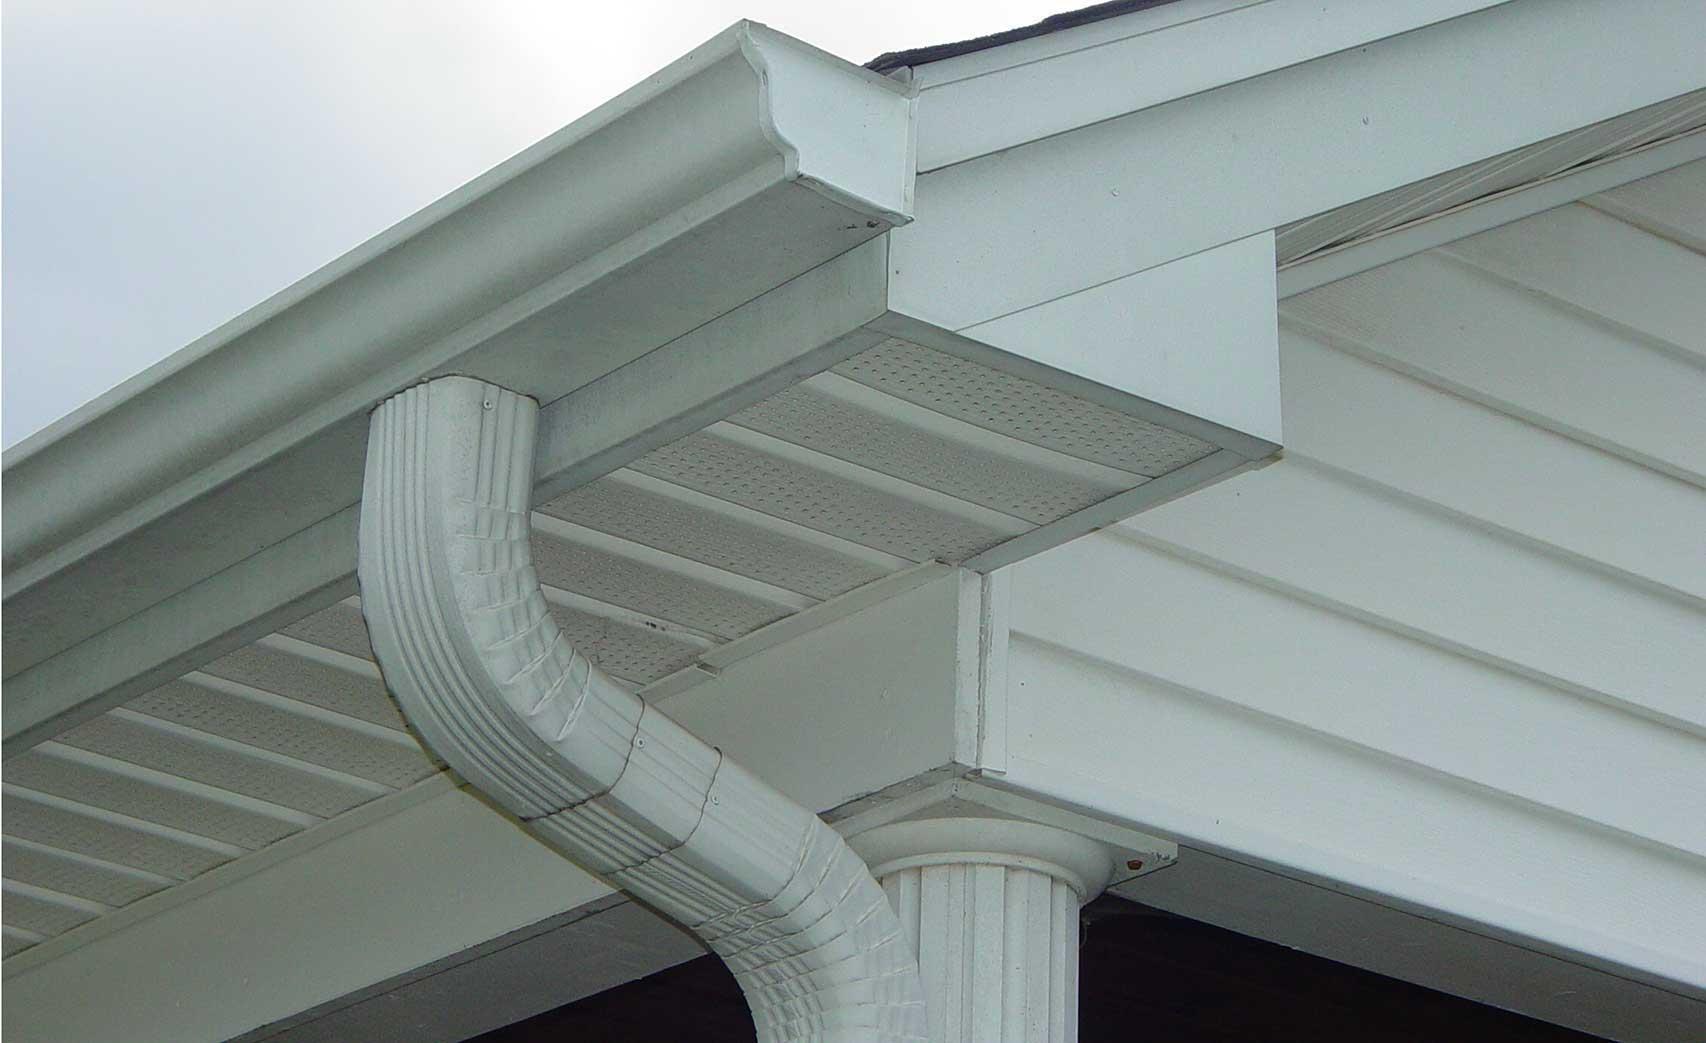 Gutter Cleaning & Repair, Siding, Soffits & Trim | B&D Spouting Co.